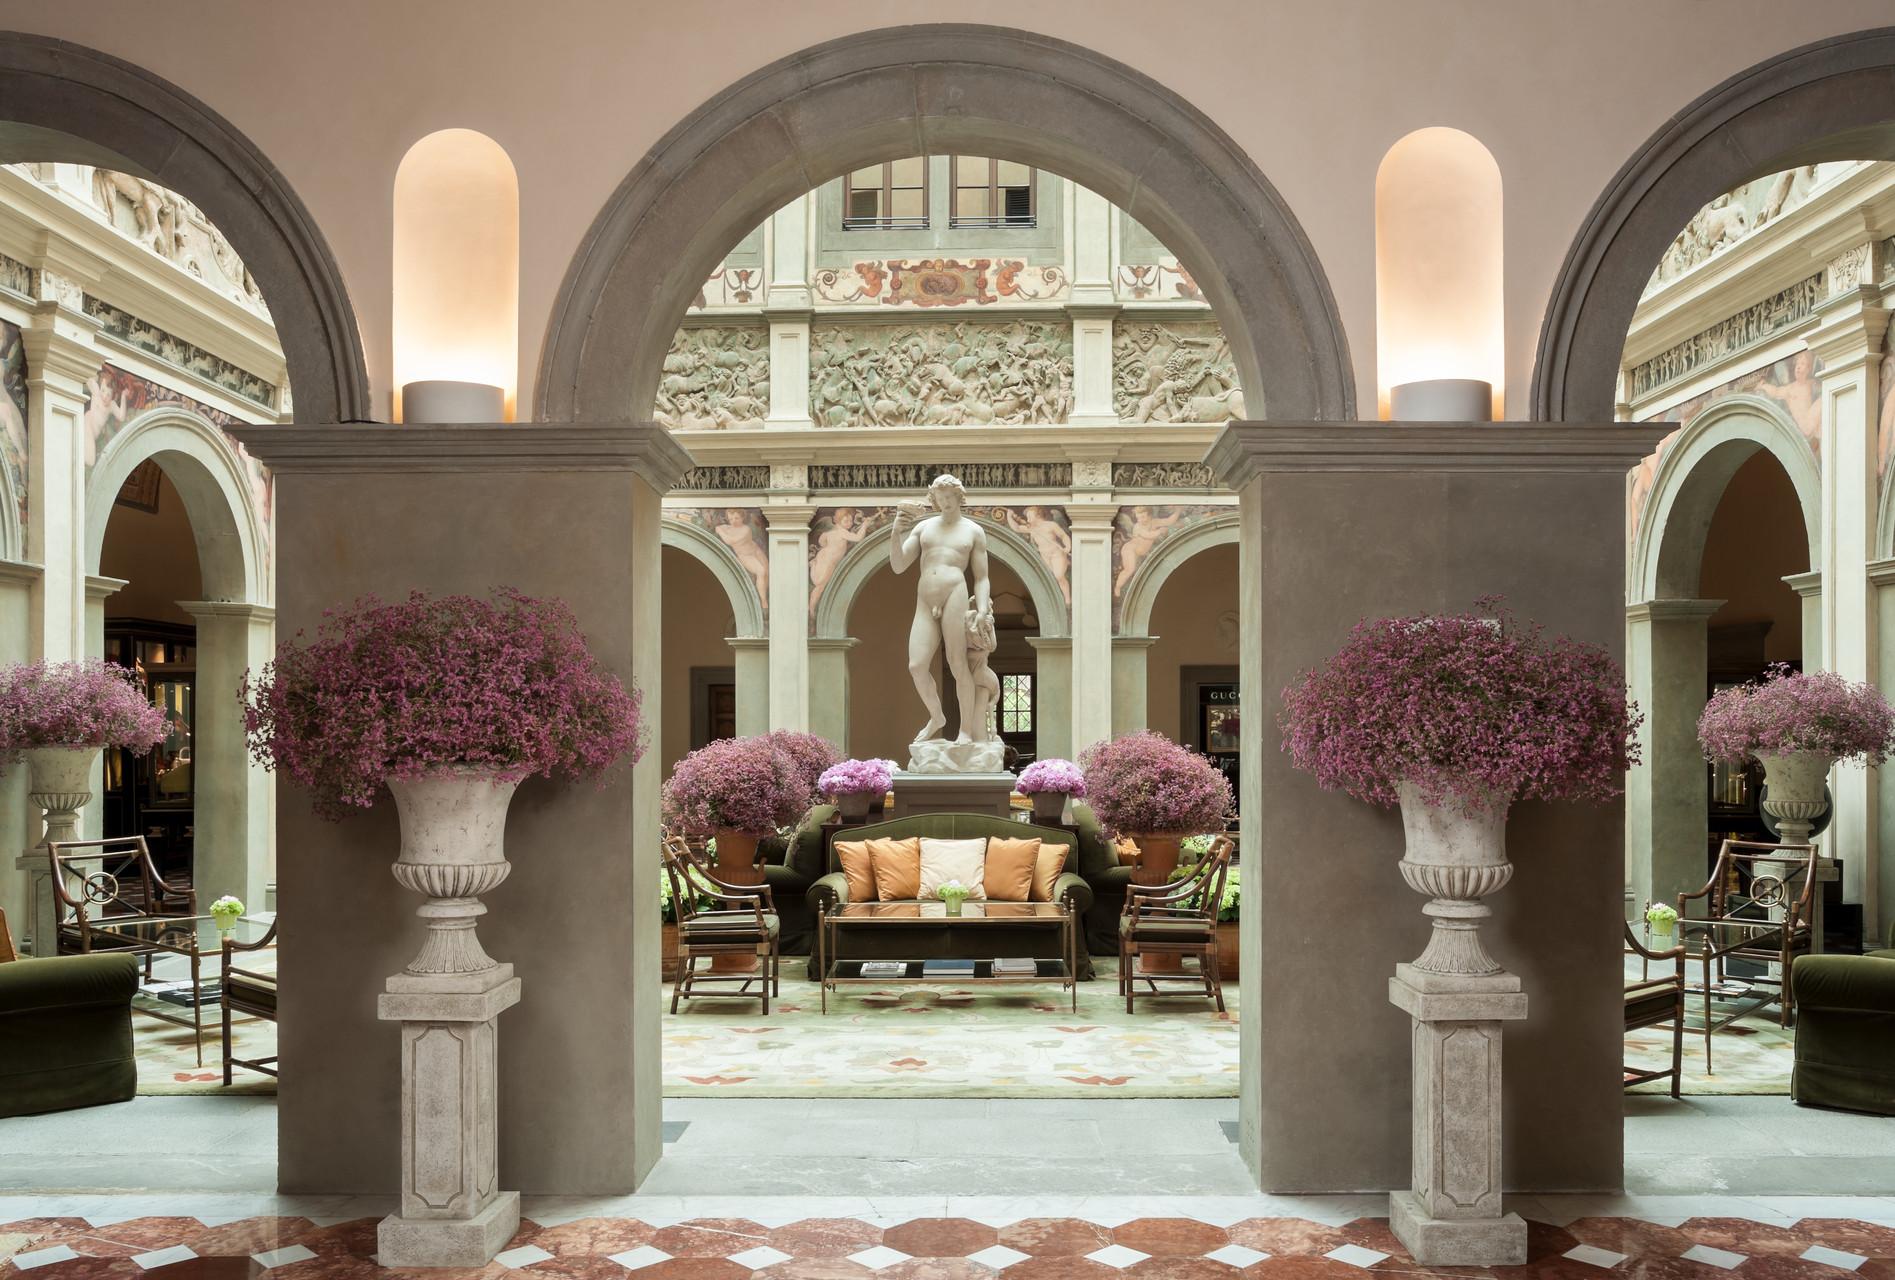 Four Seasons Hotel Firenze Lobby.jpg